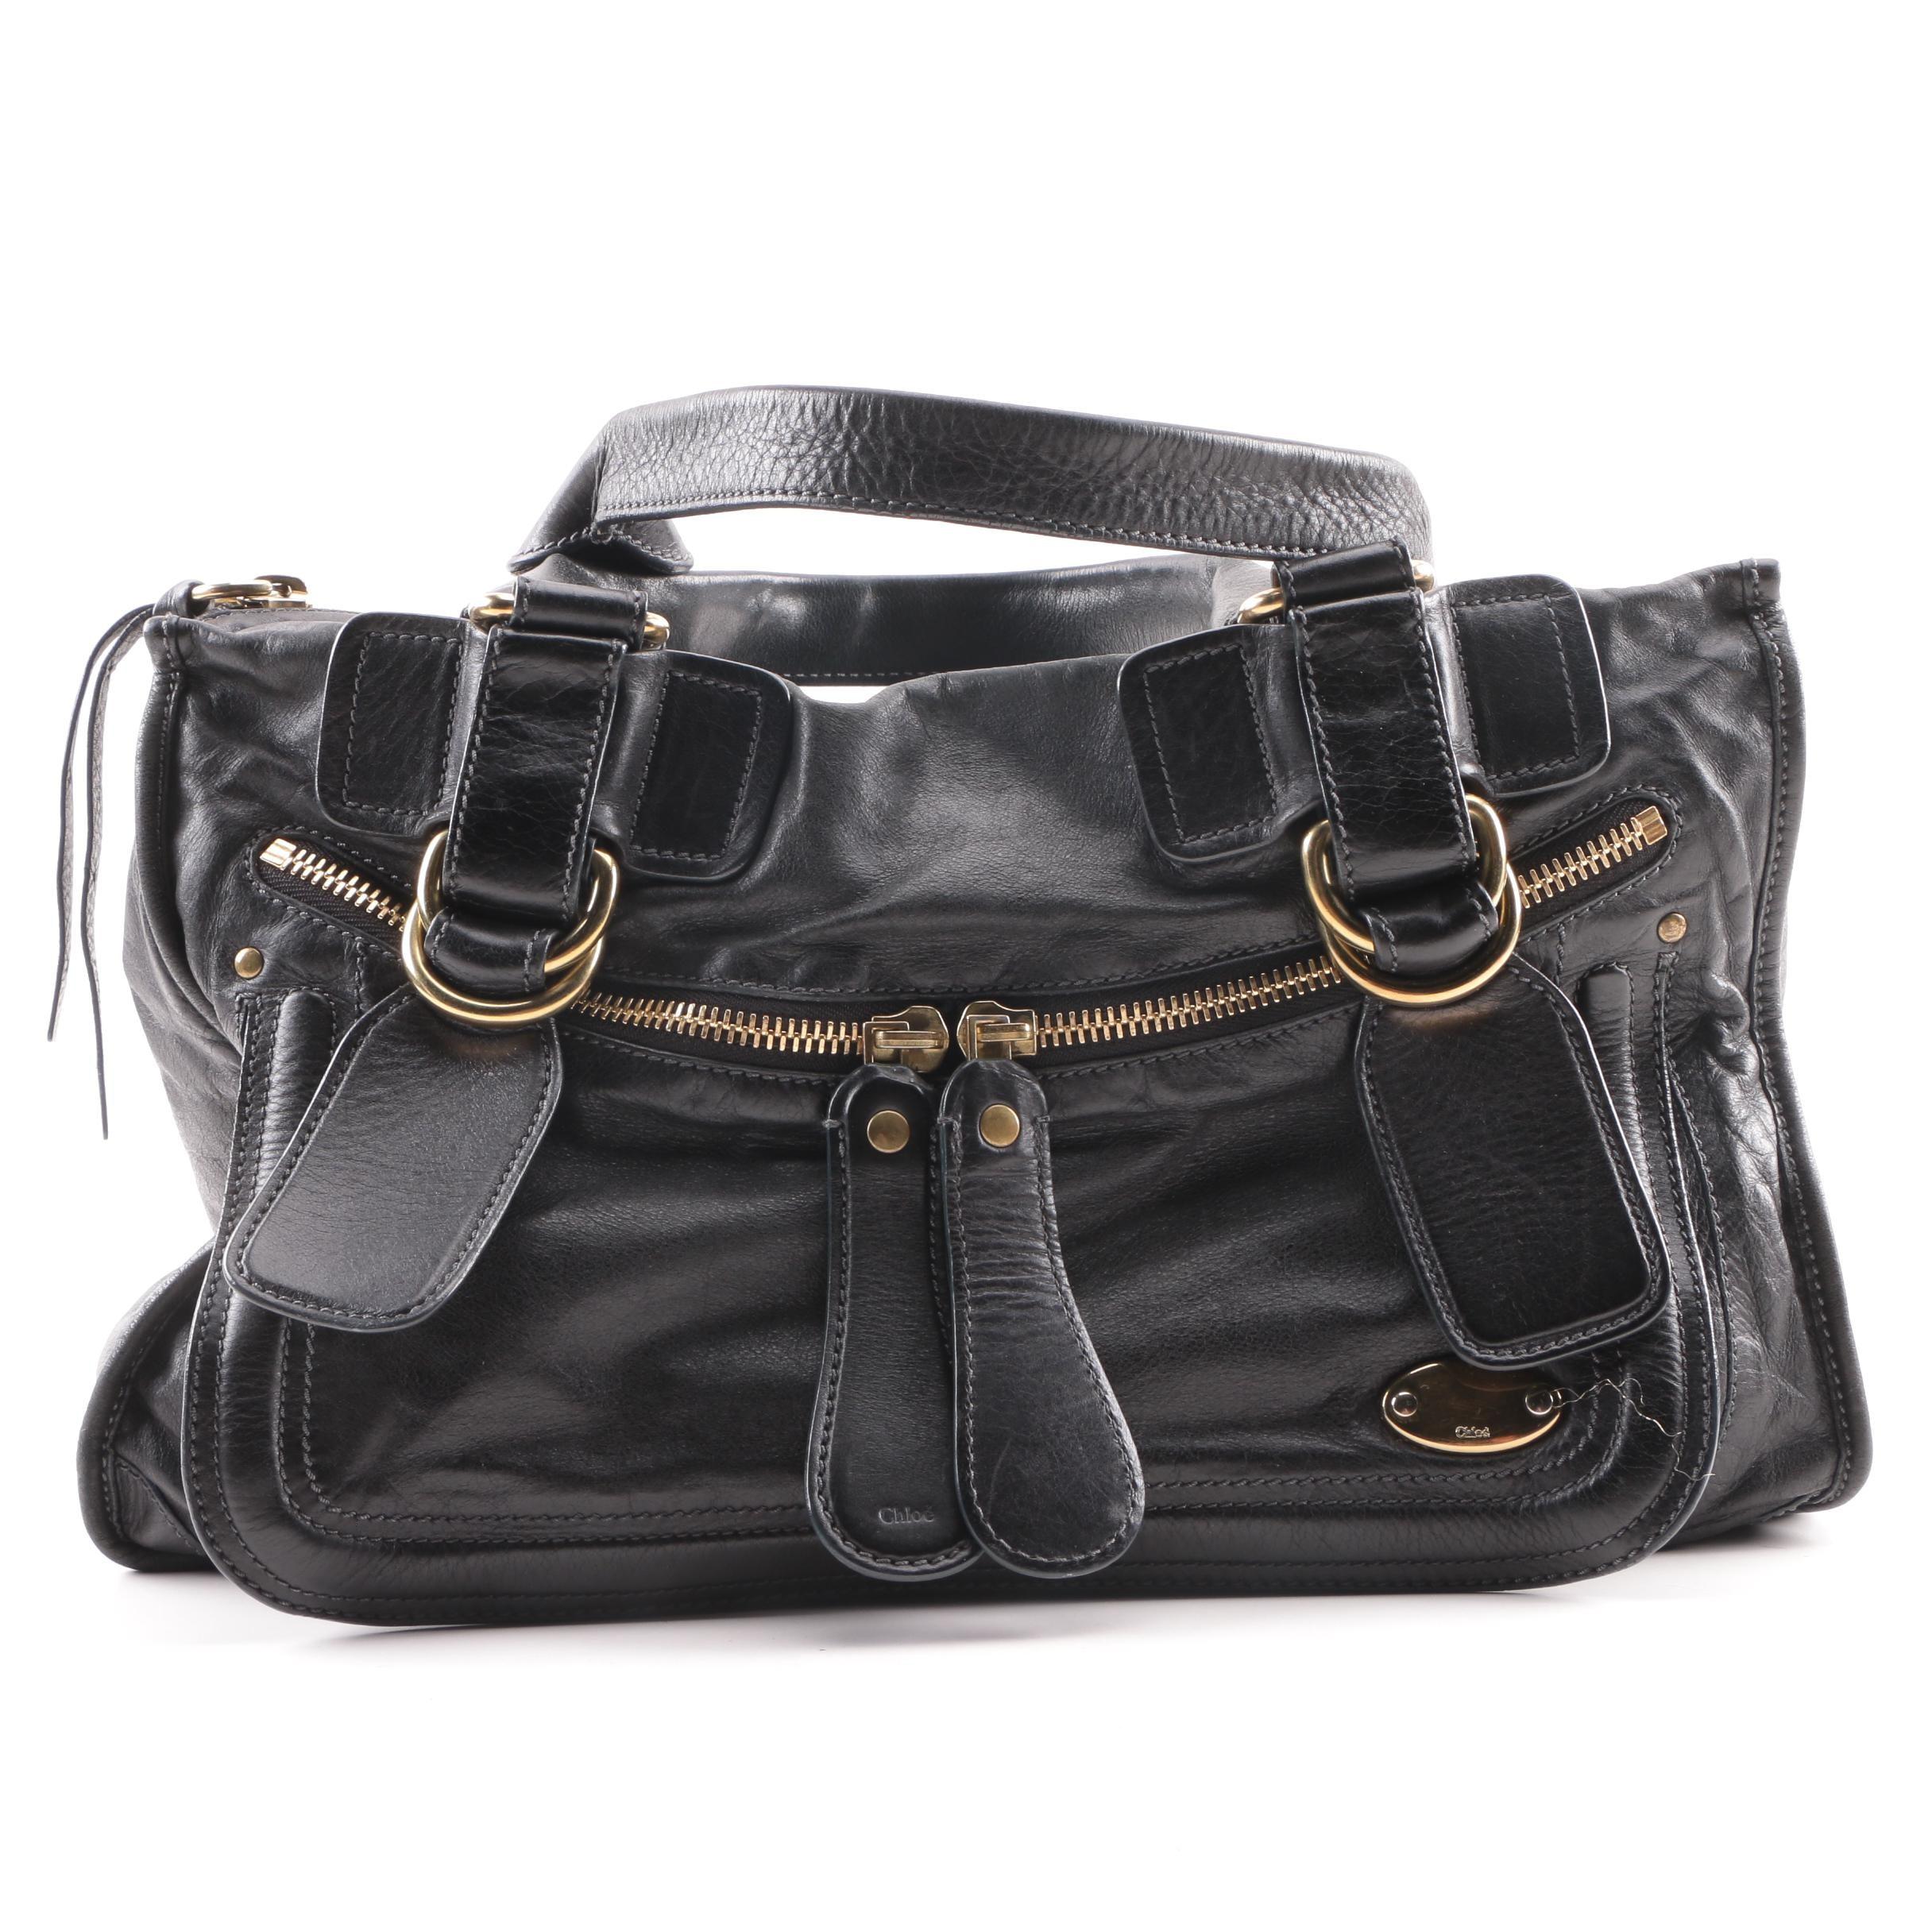 Chloé Black Leather Satchel